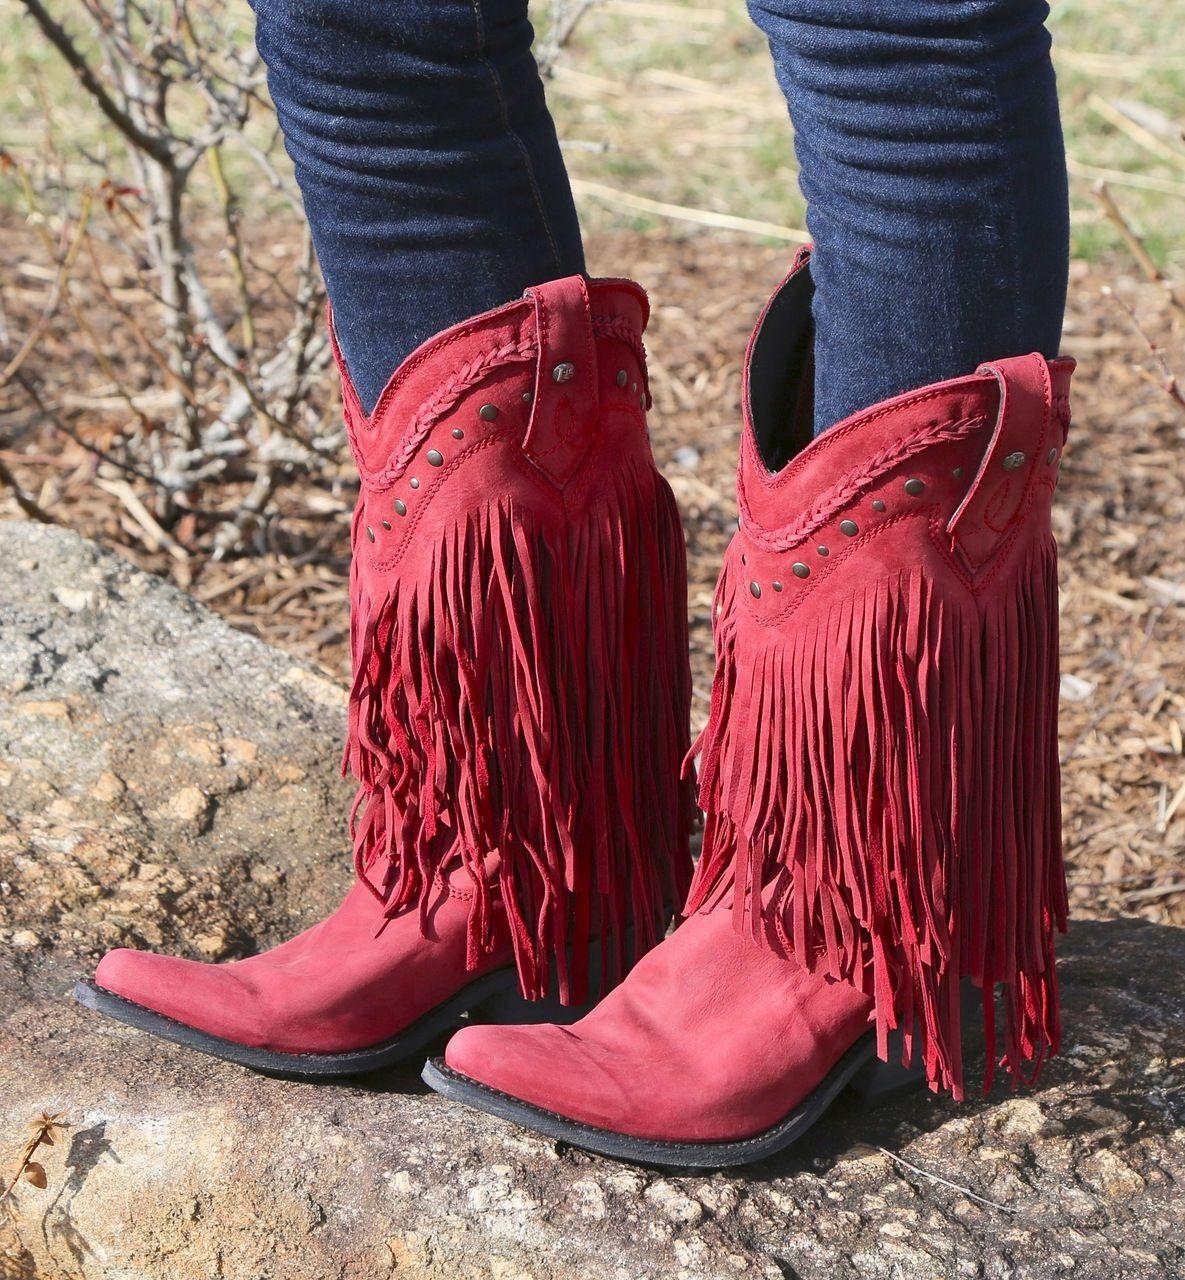 Rivertrail Mercantile - Liberty Black Vegas Fringe Boots Rojo LB71124, $360.00 (http://www.rivertrailmercantile.com/liberty-black-vegas-fringe-boots-rojo-lb71124/)